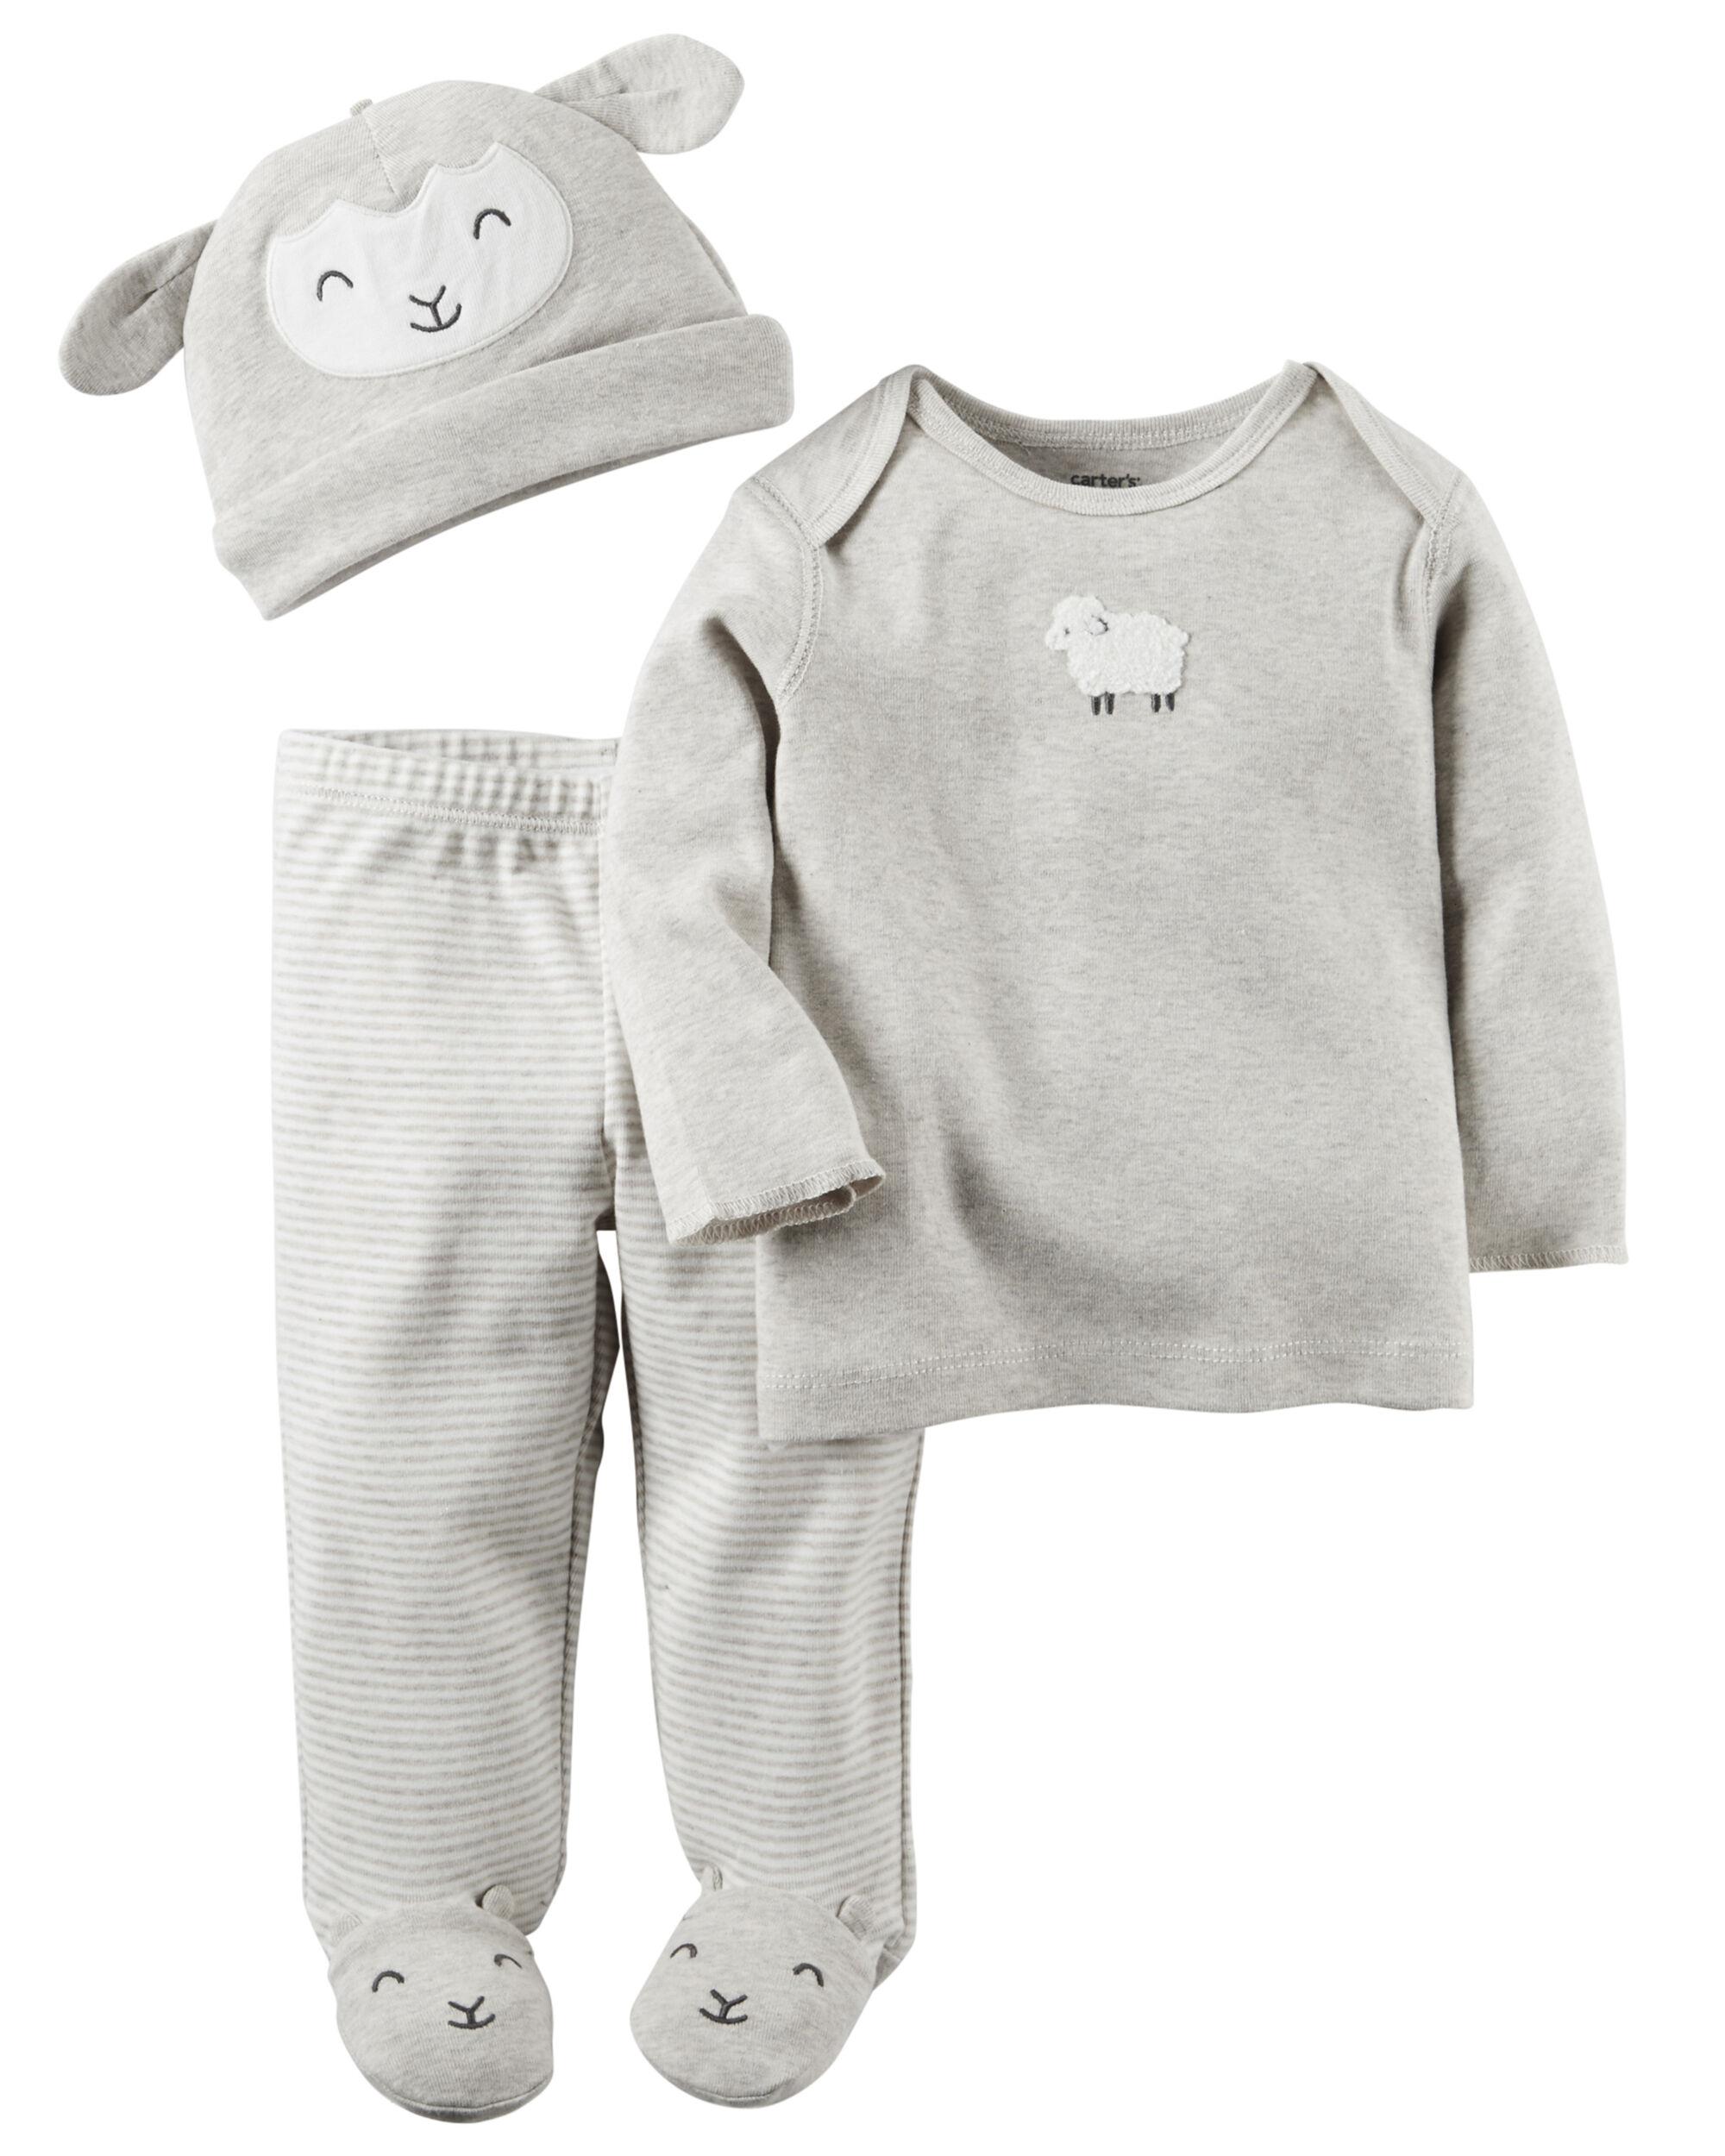 3 Piece Babysoft Footed Pant Set